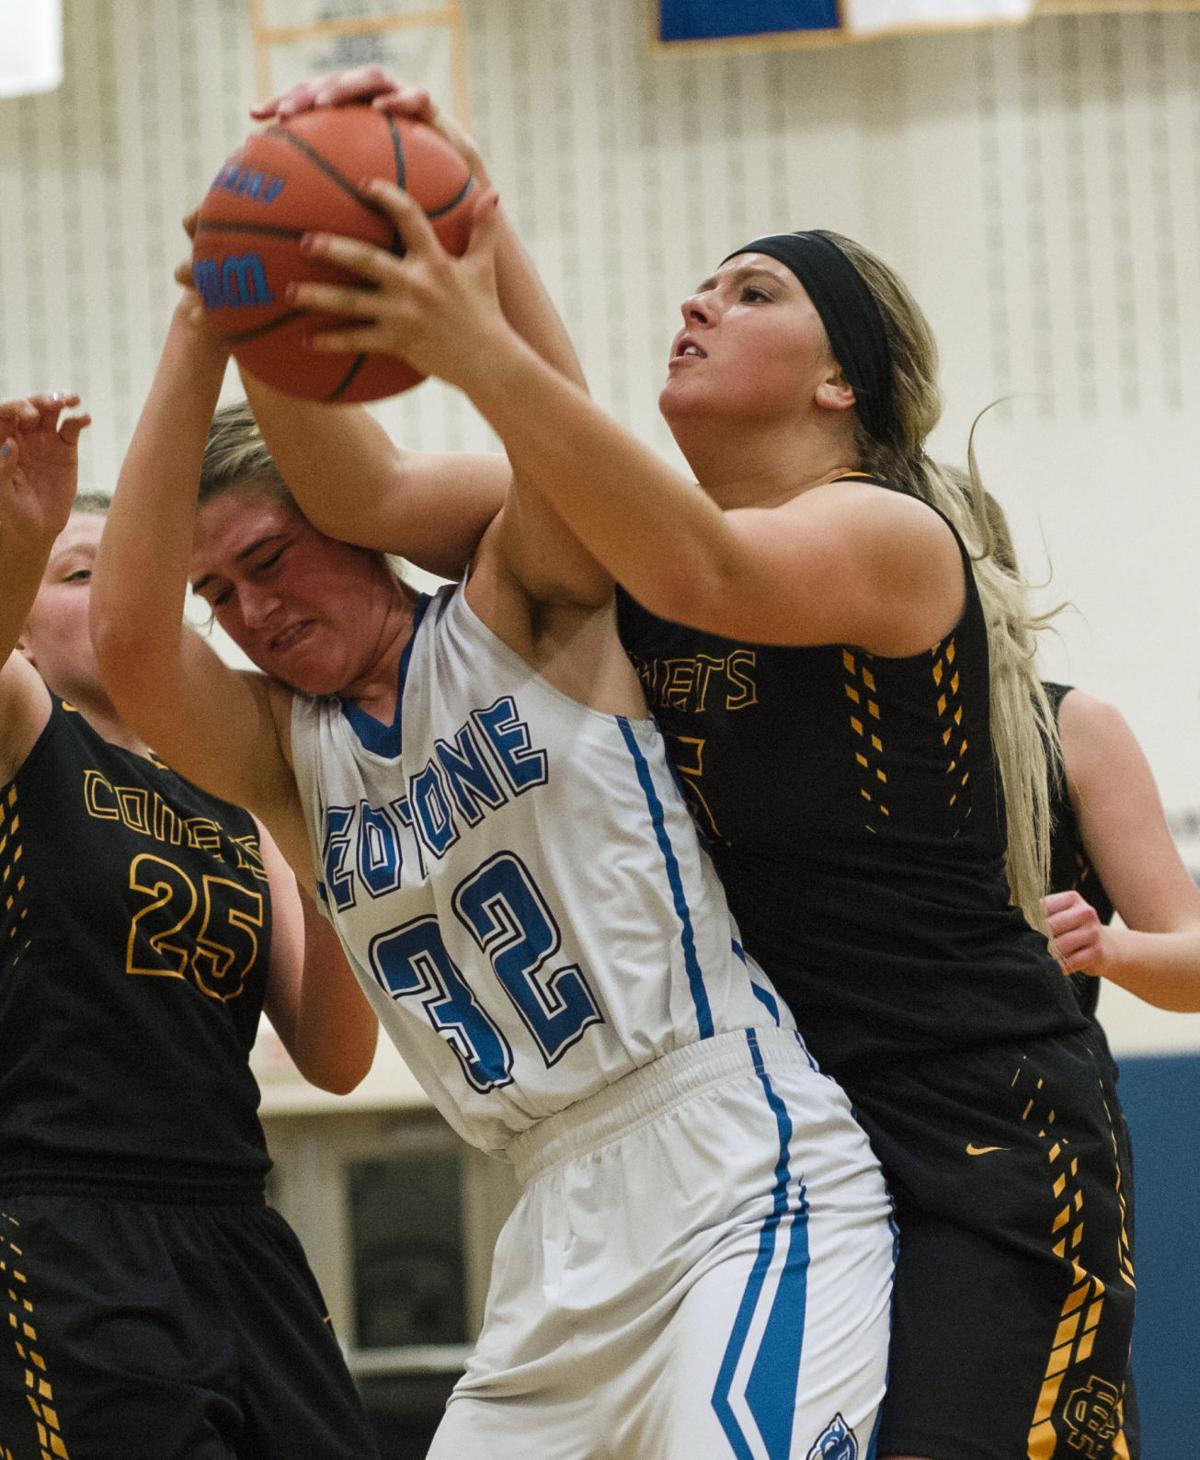 Reed Custer vs Peotone Girls Basketball